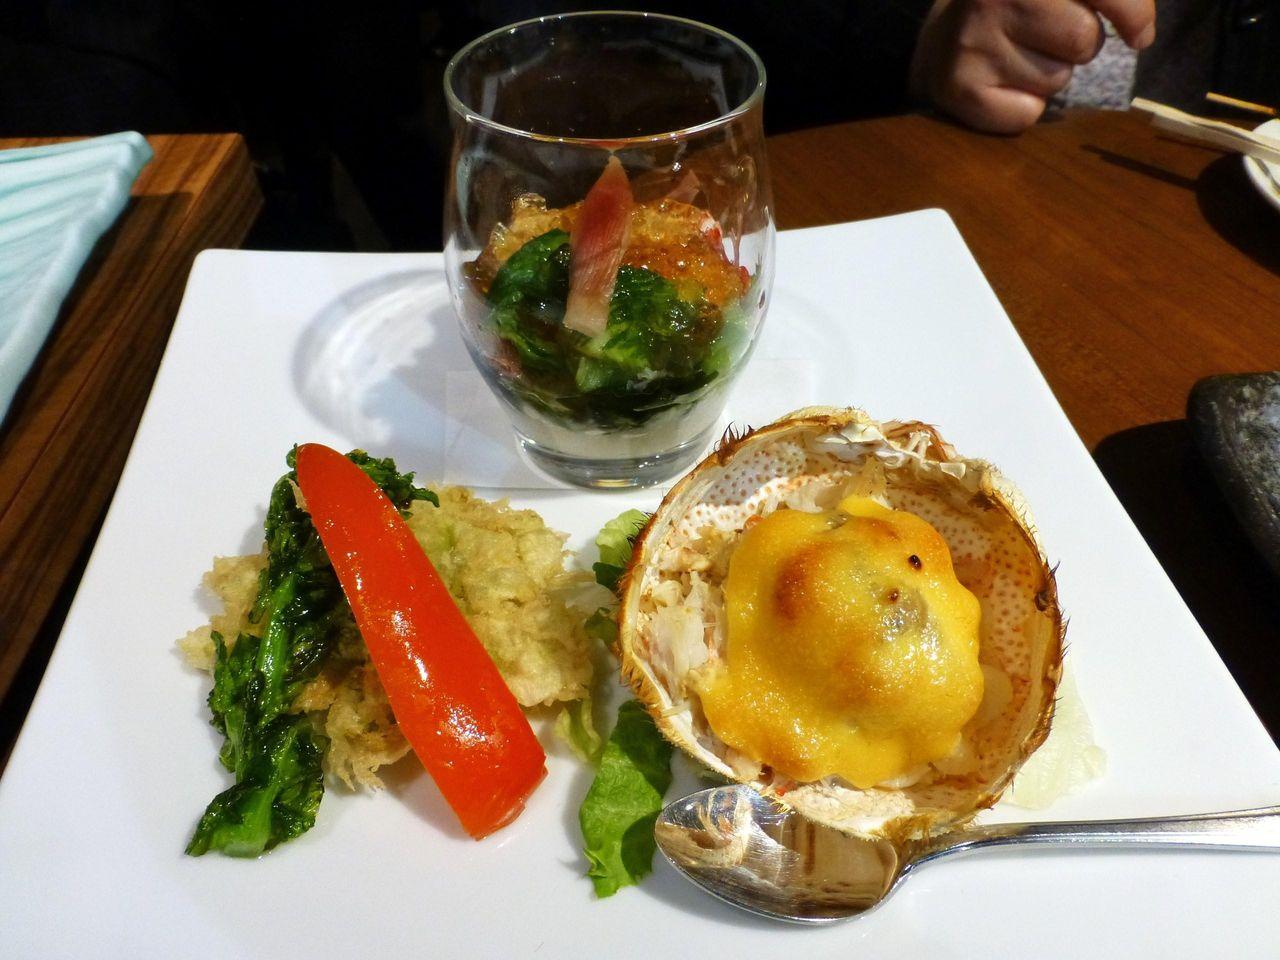 北海道産毛ガニ(限定5食)1,344円